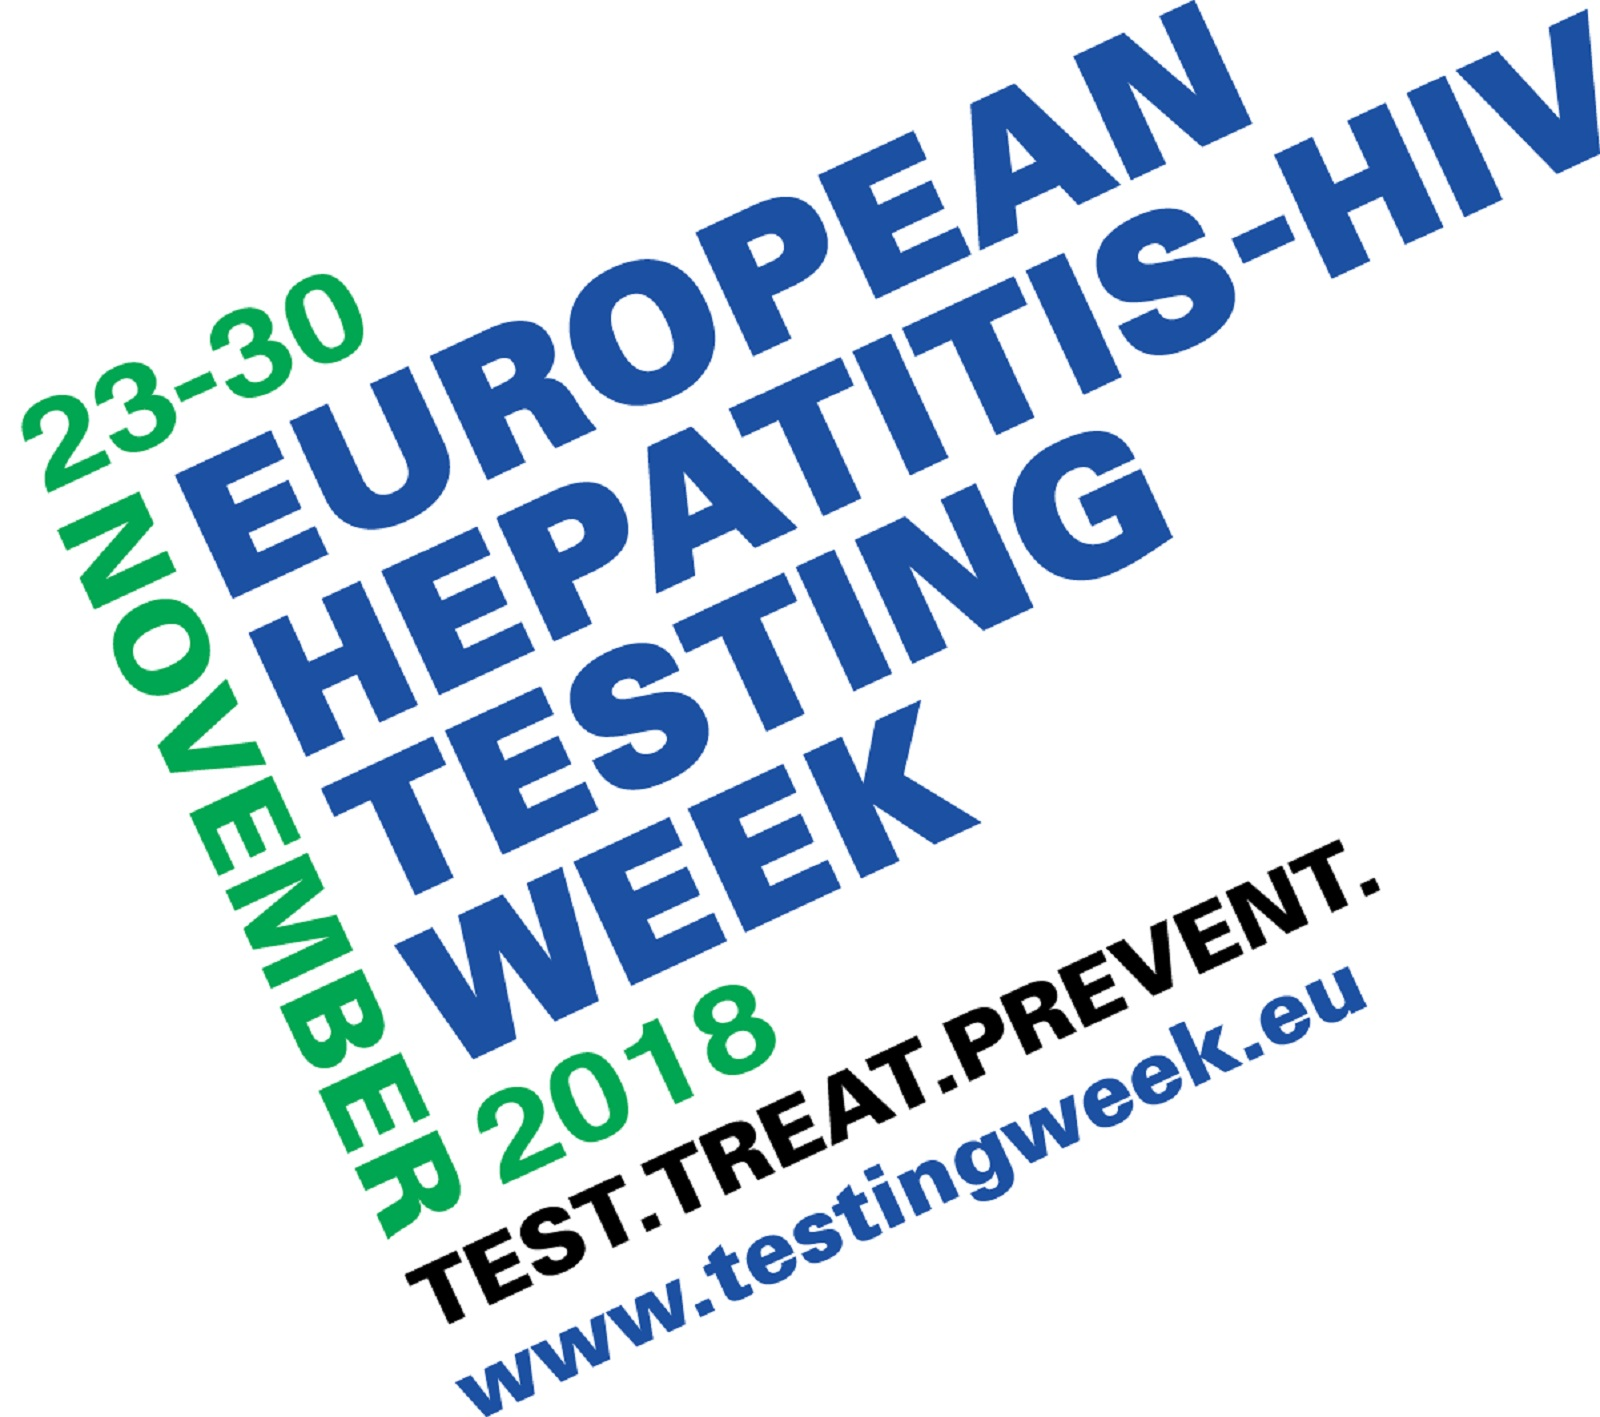 European Testing Week 01